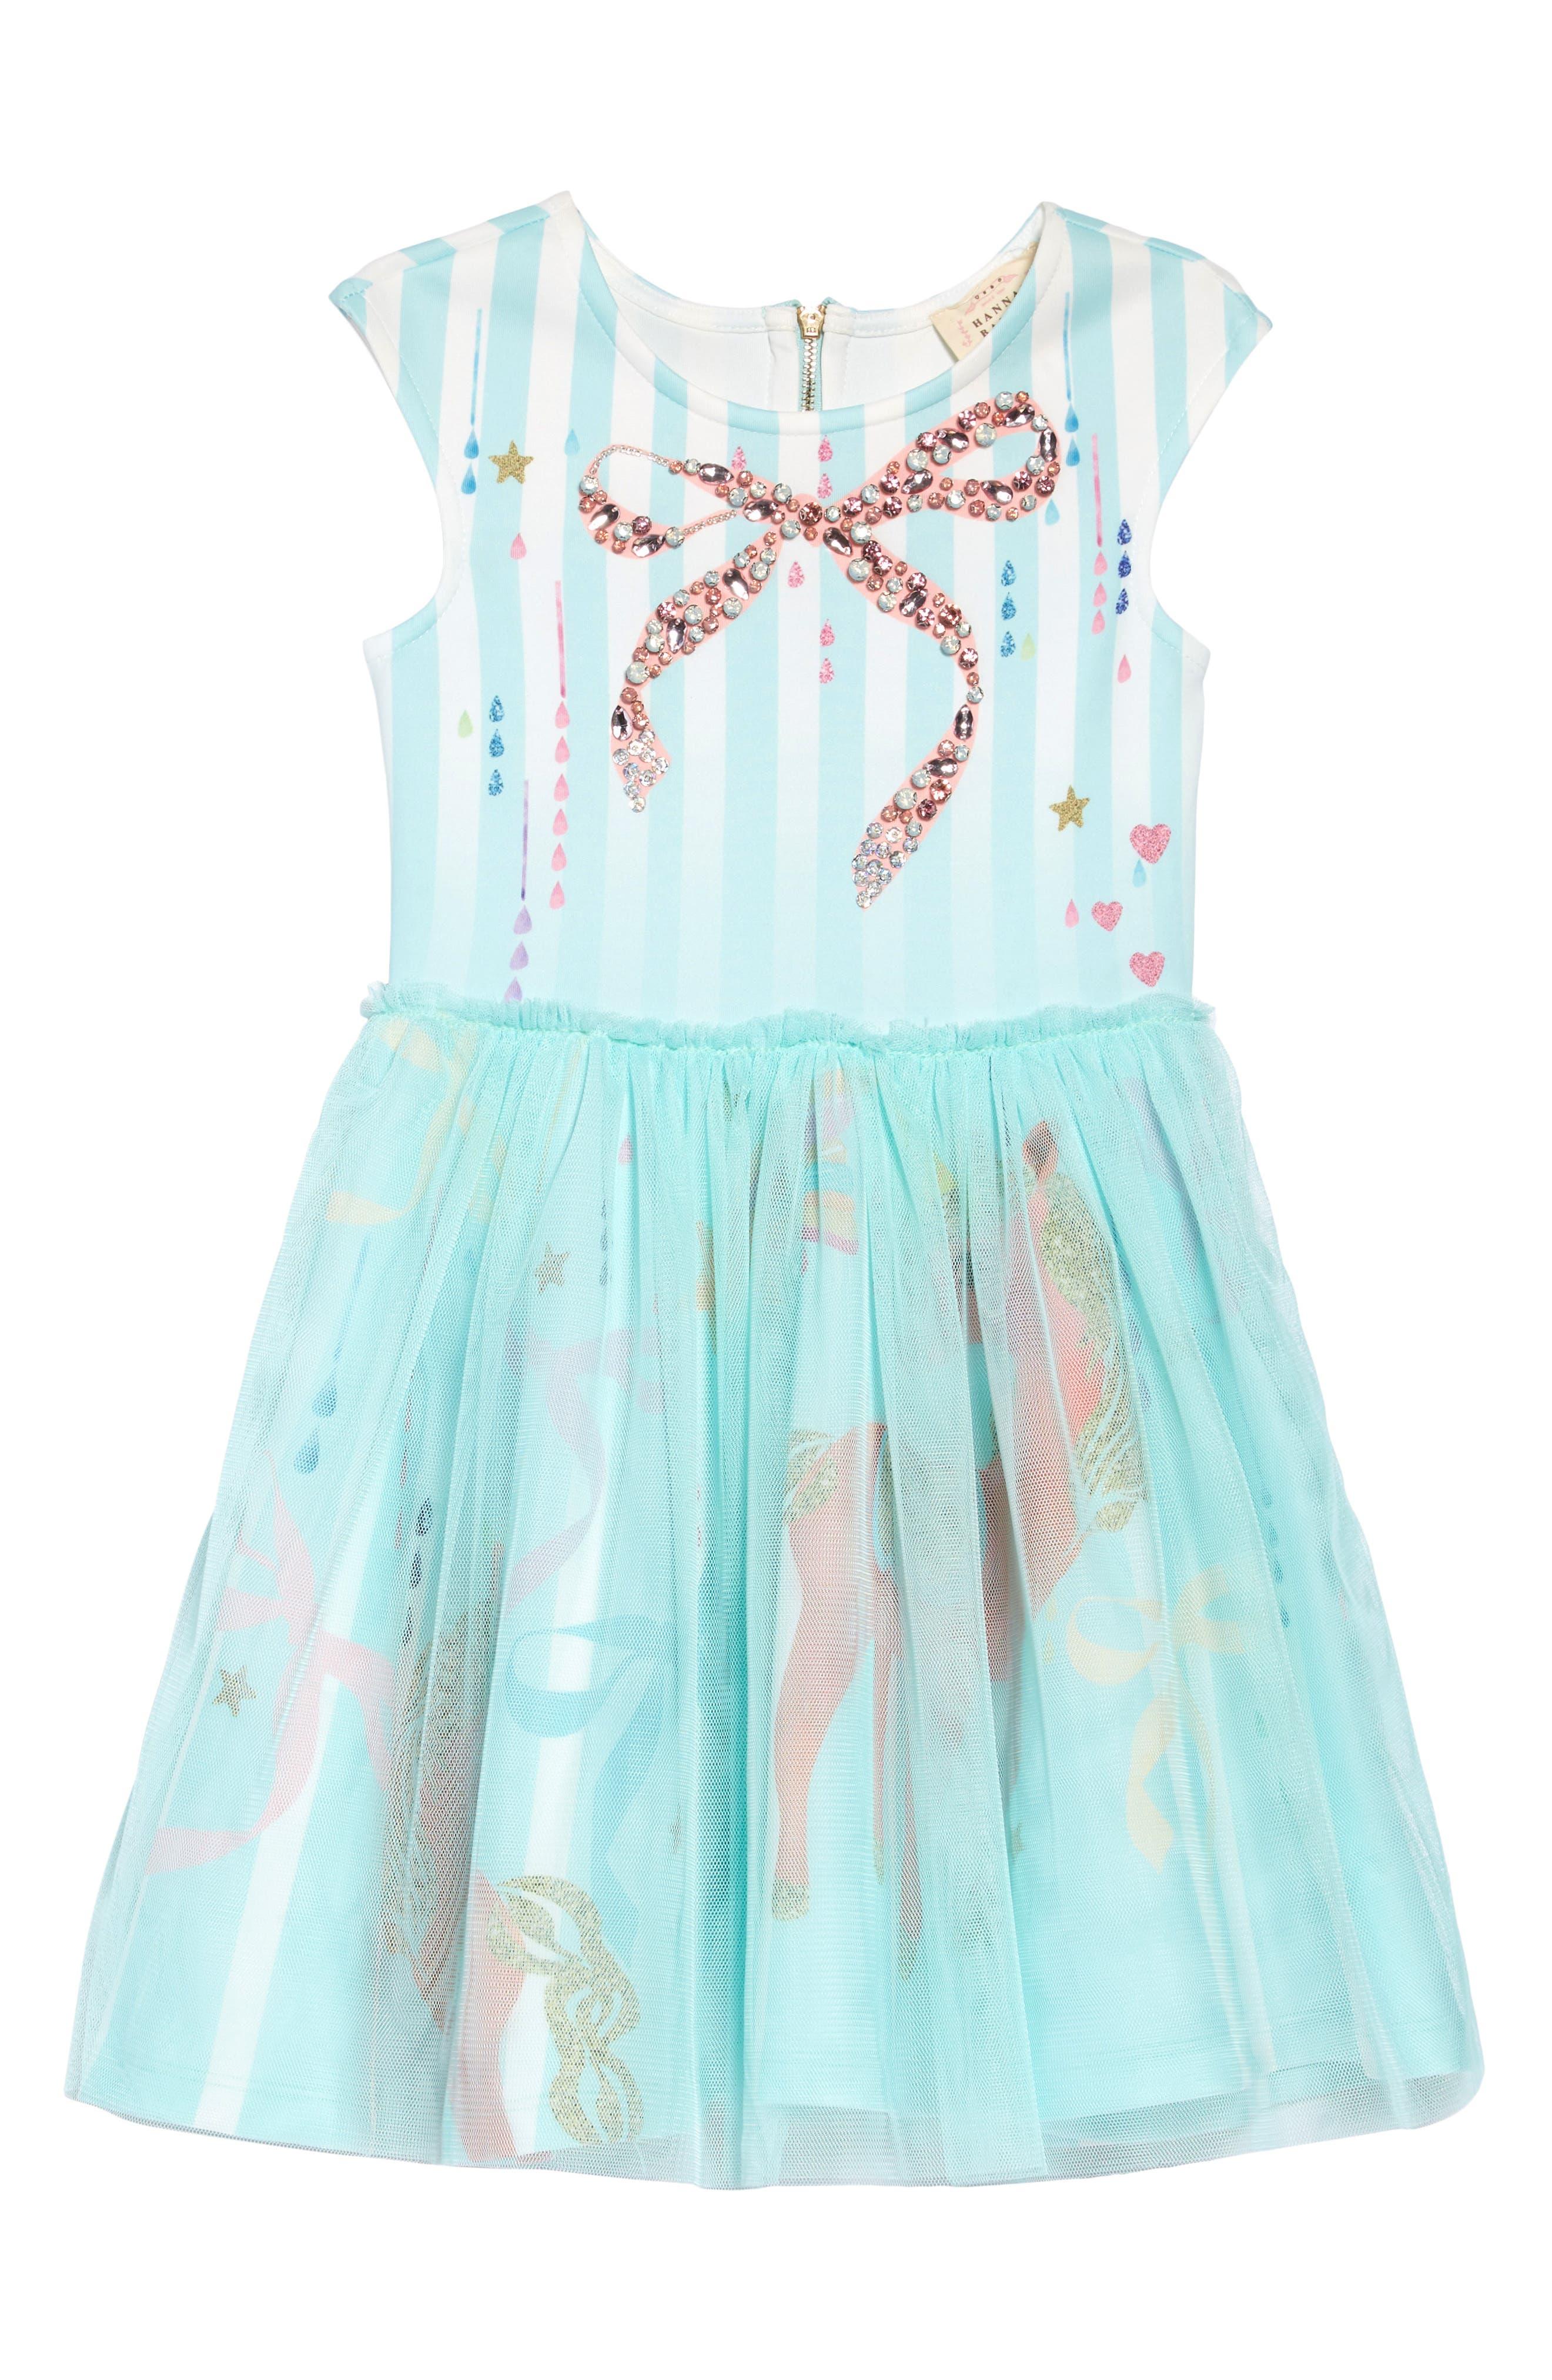 HANNAH BANANA, Bow & Unicorn Fit & Flare Tulle Dress, Main thumbnail 1, color, MINT MULTI